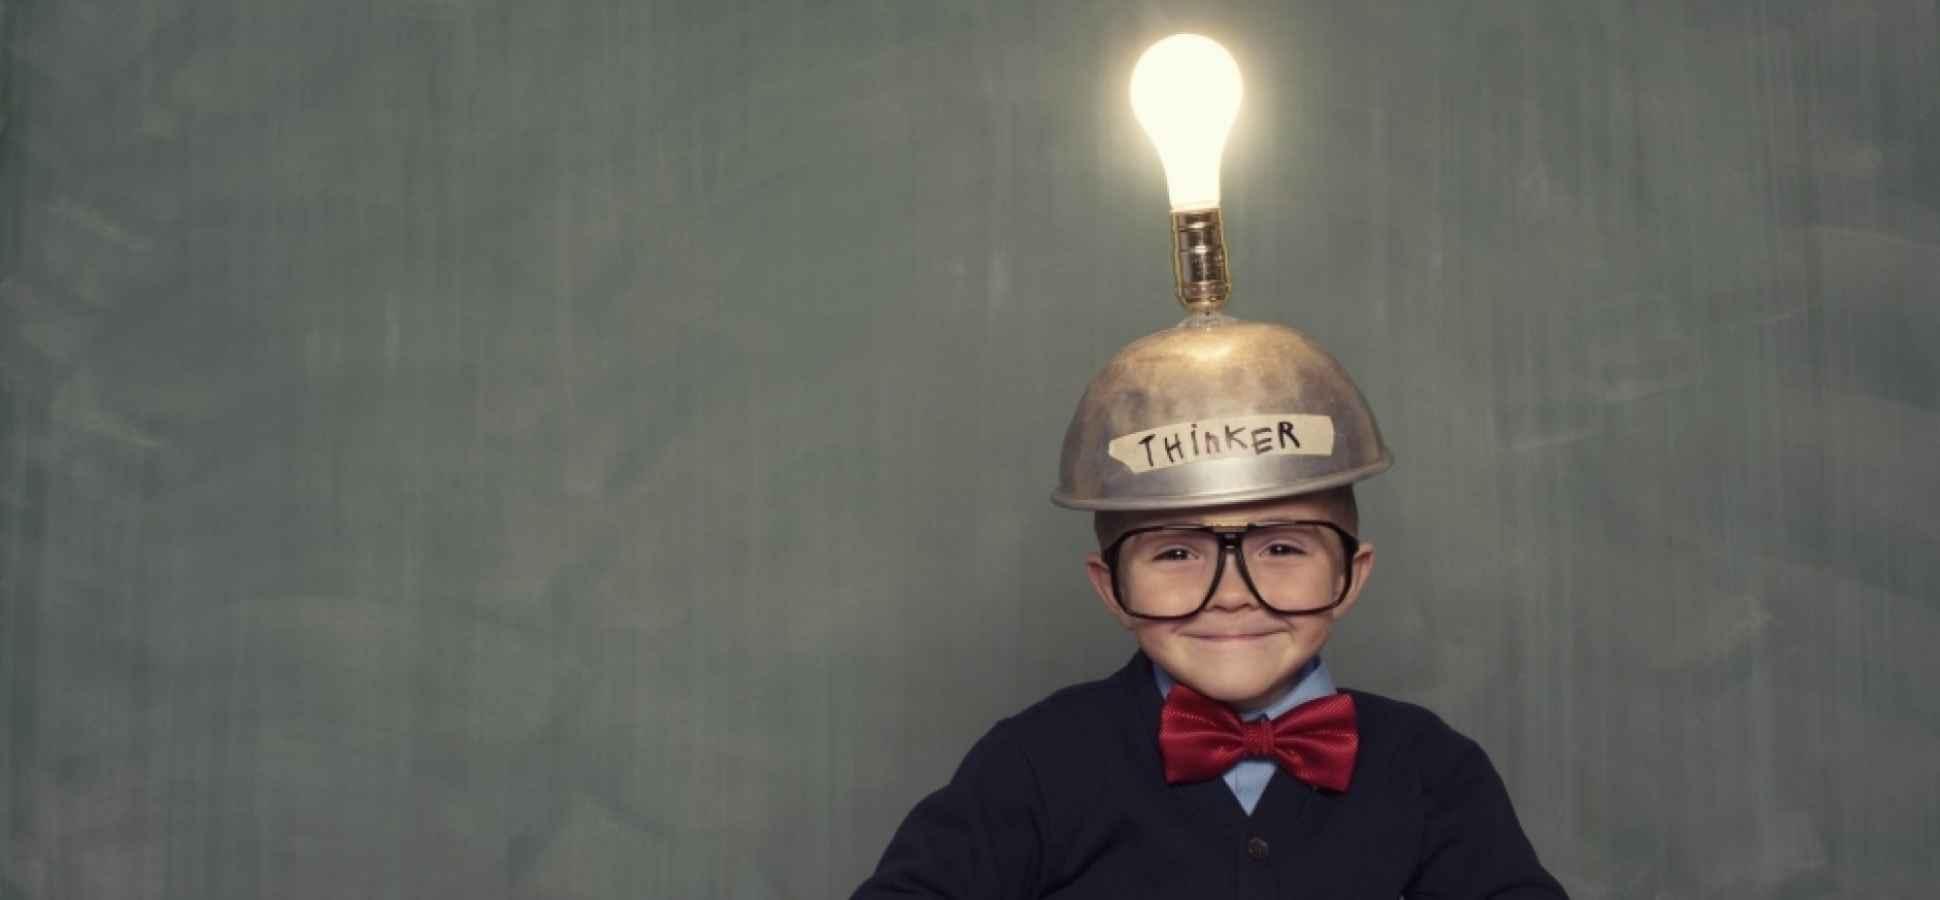 3 Places to Find Entrepreneurship Inspiration